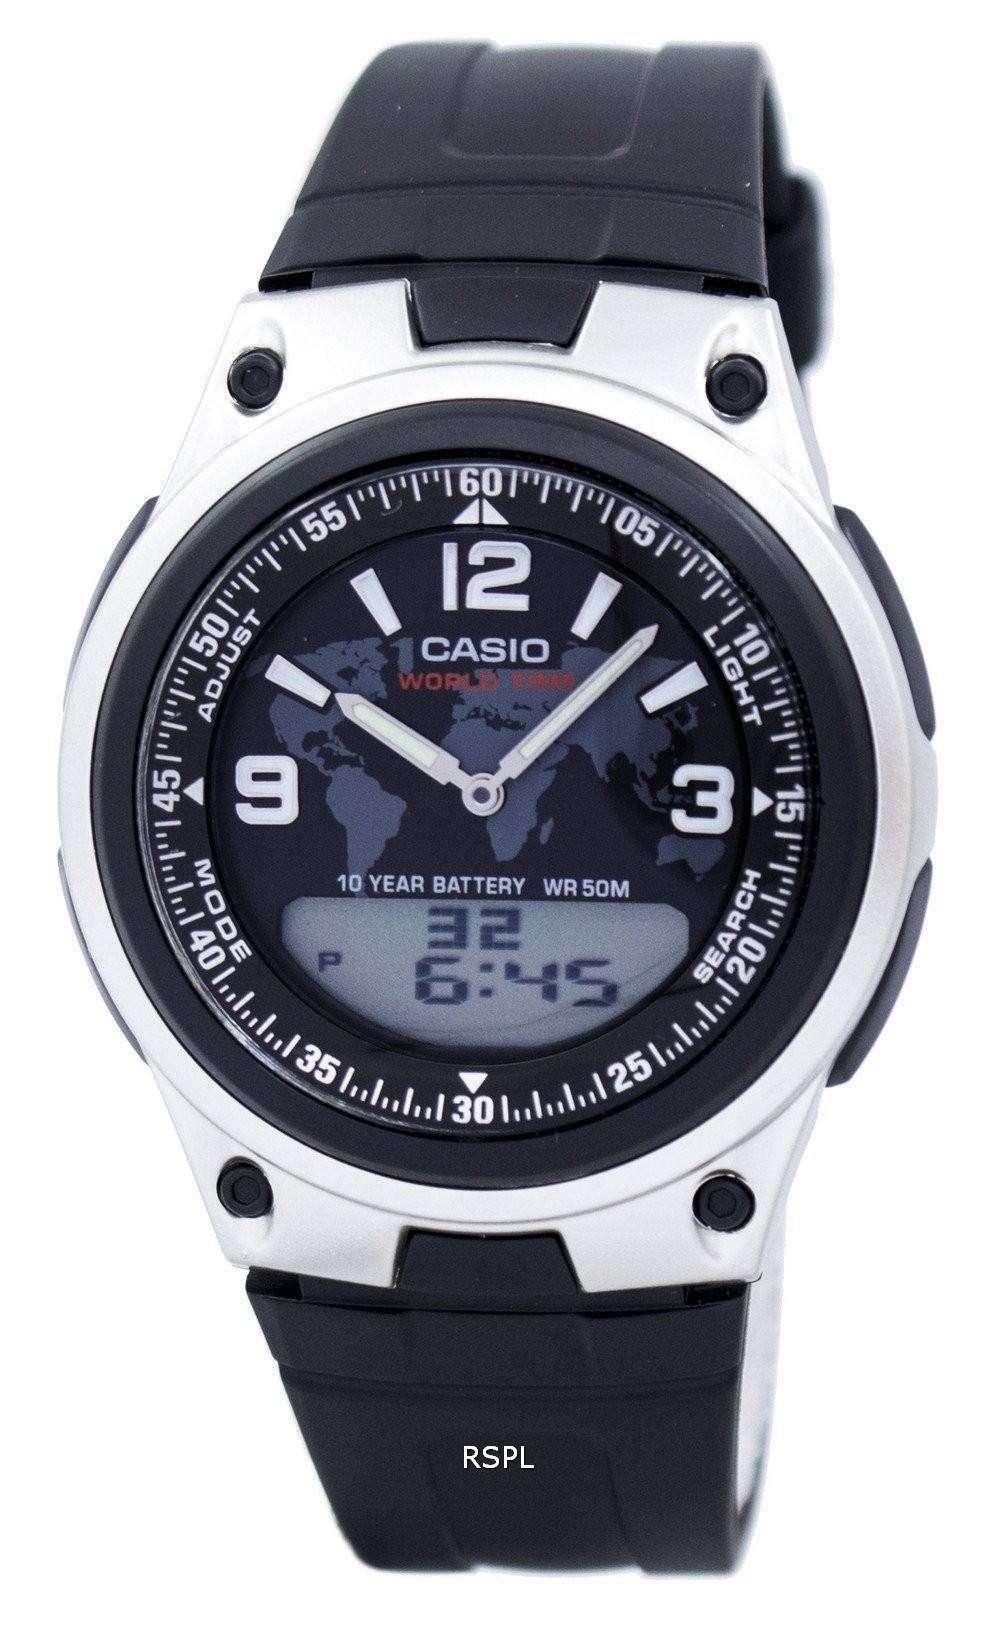 bc9dfd564598 Reloj Casio Databank mundo tiempo Telememo Analógico Digital AW-80-1A2V